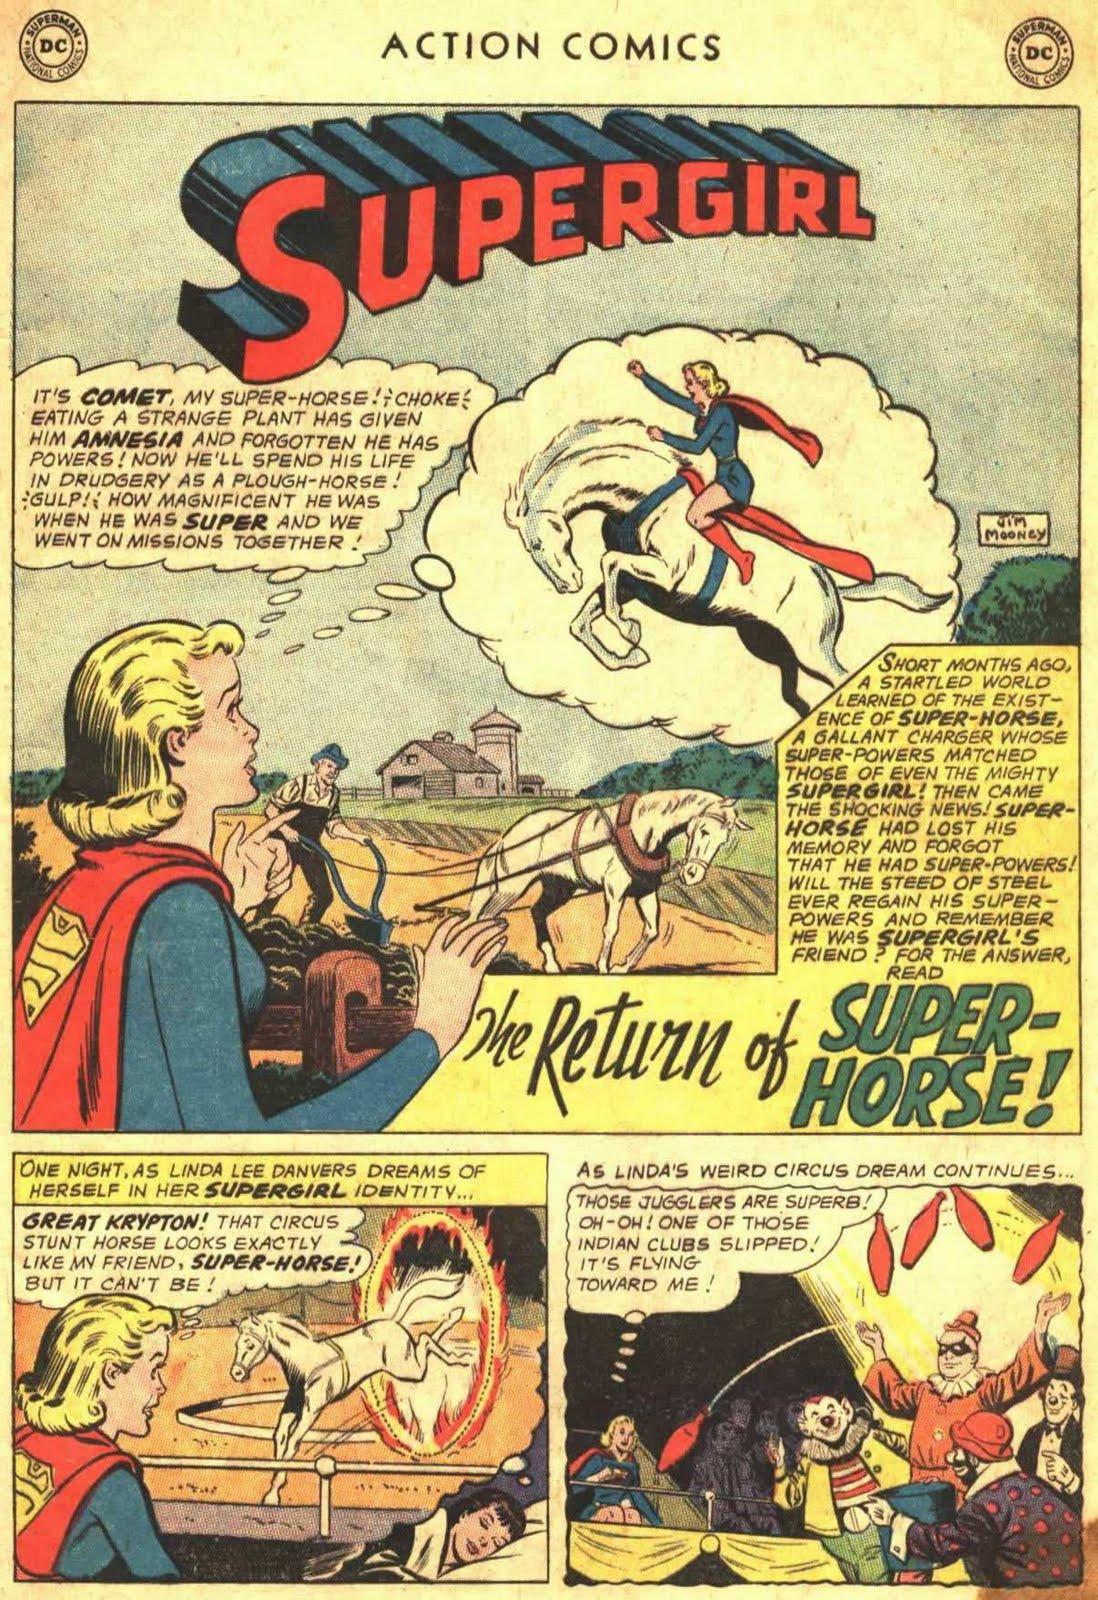 Action comics 300 the return of super horse